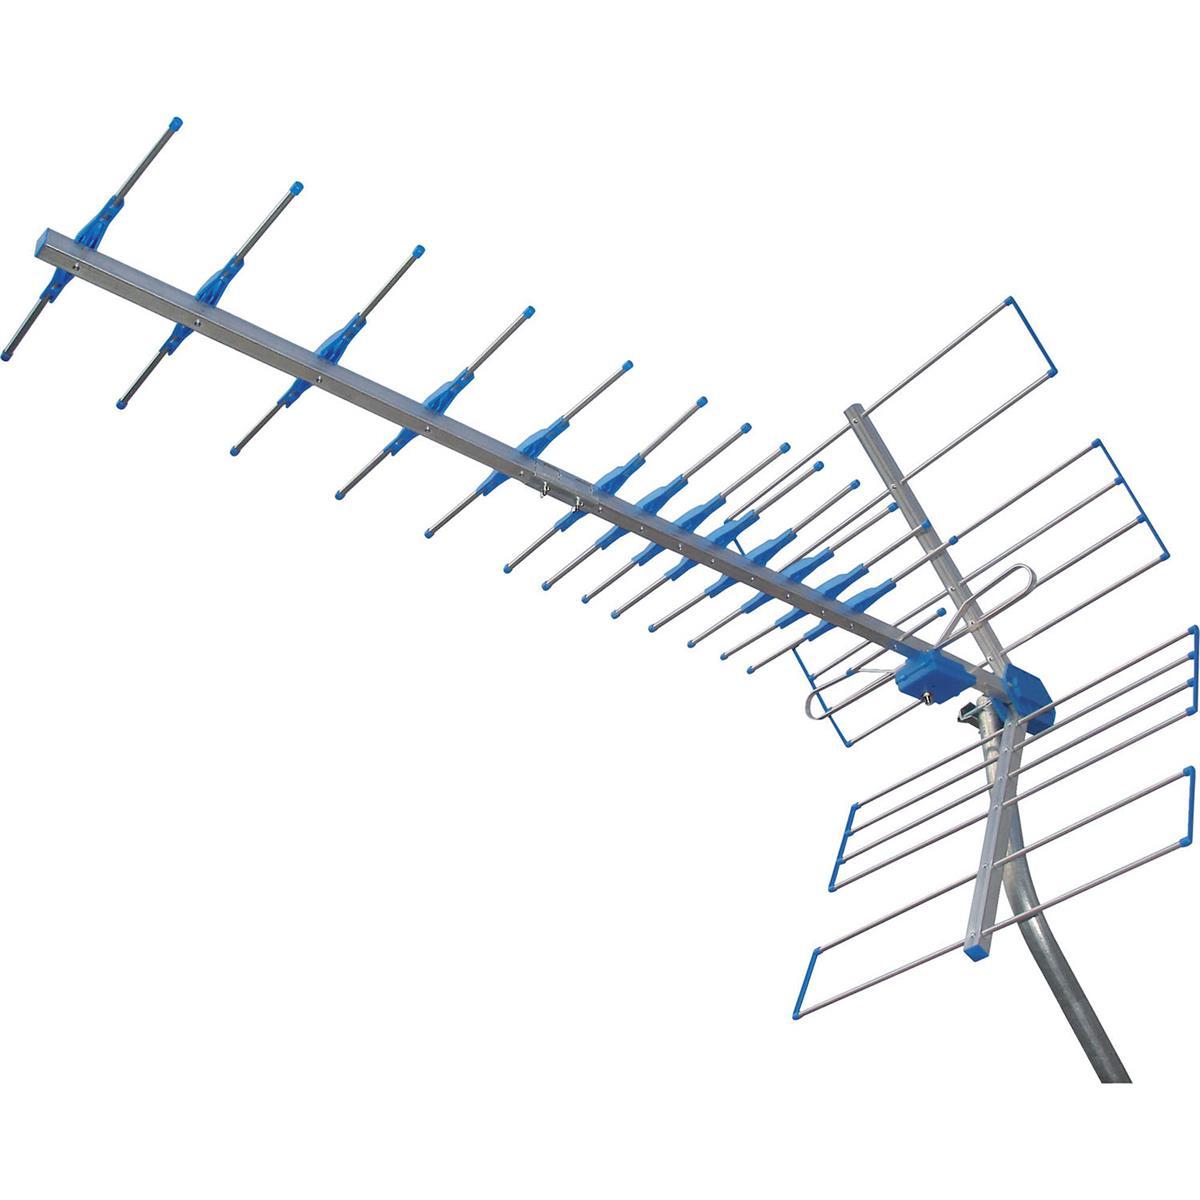 Antena Uhf Digital Yagi Com Refletor Prohd1100 Proeletronic